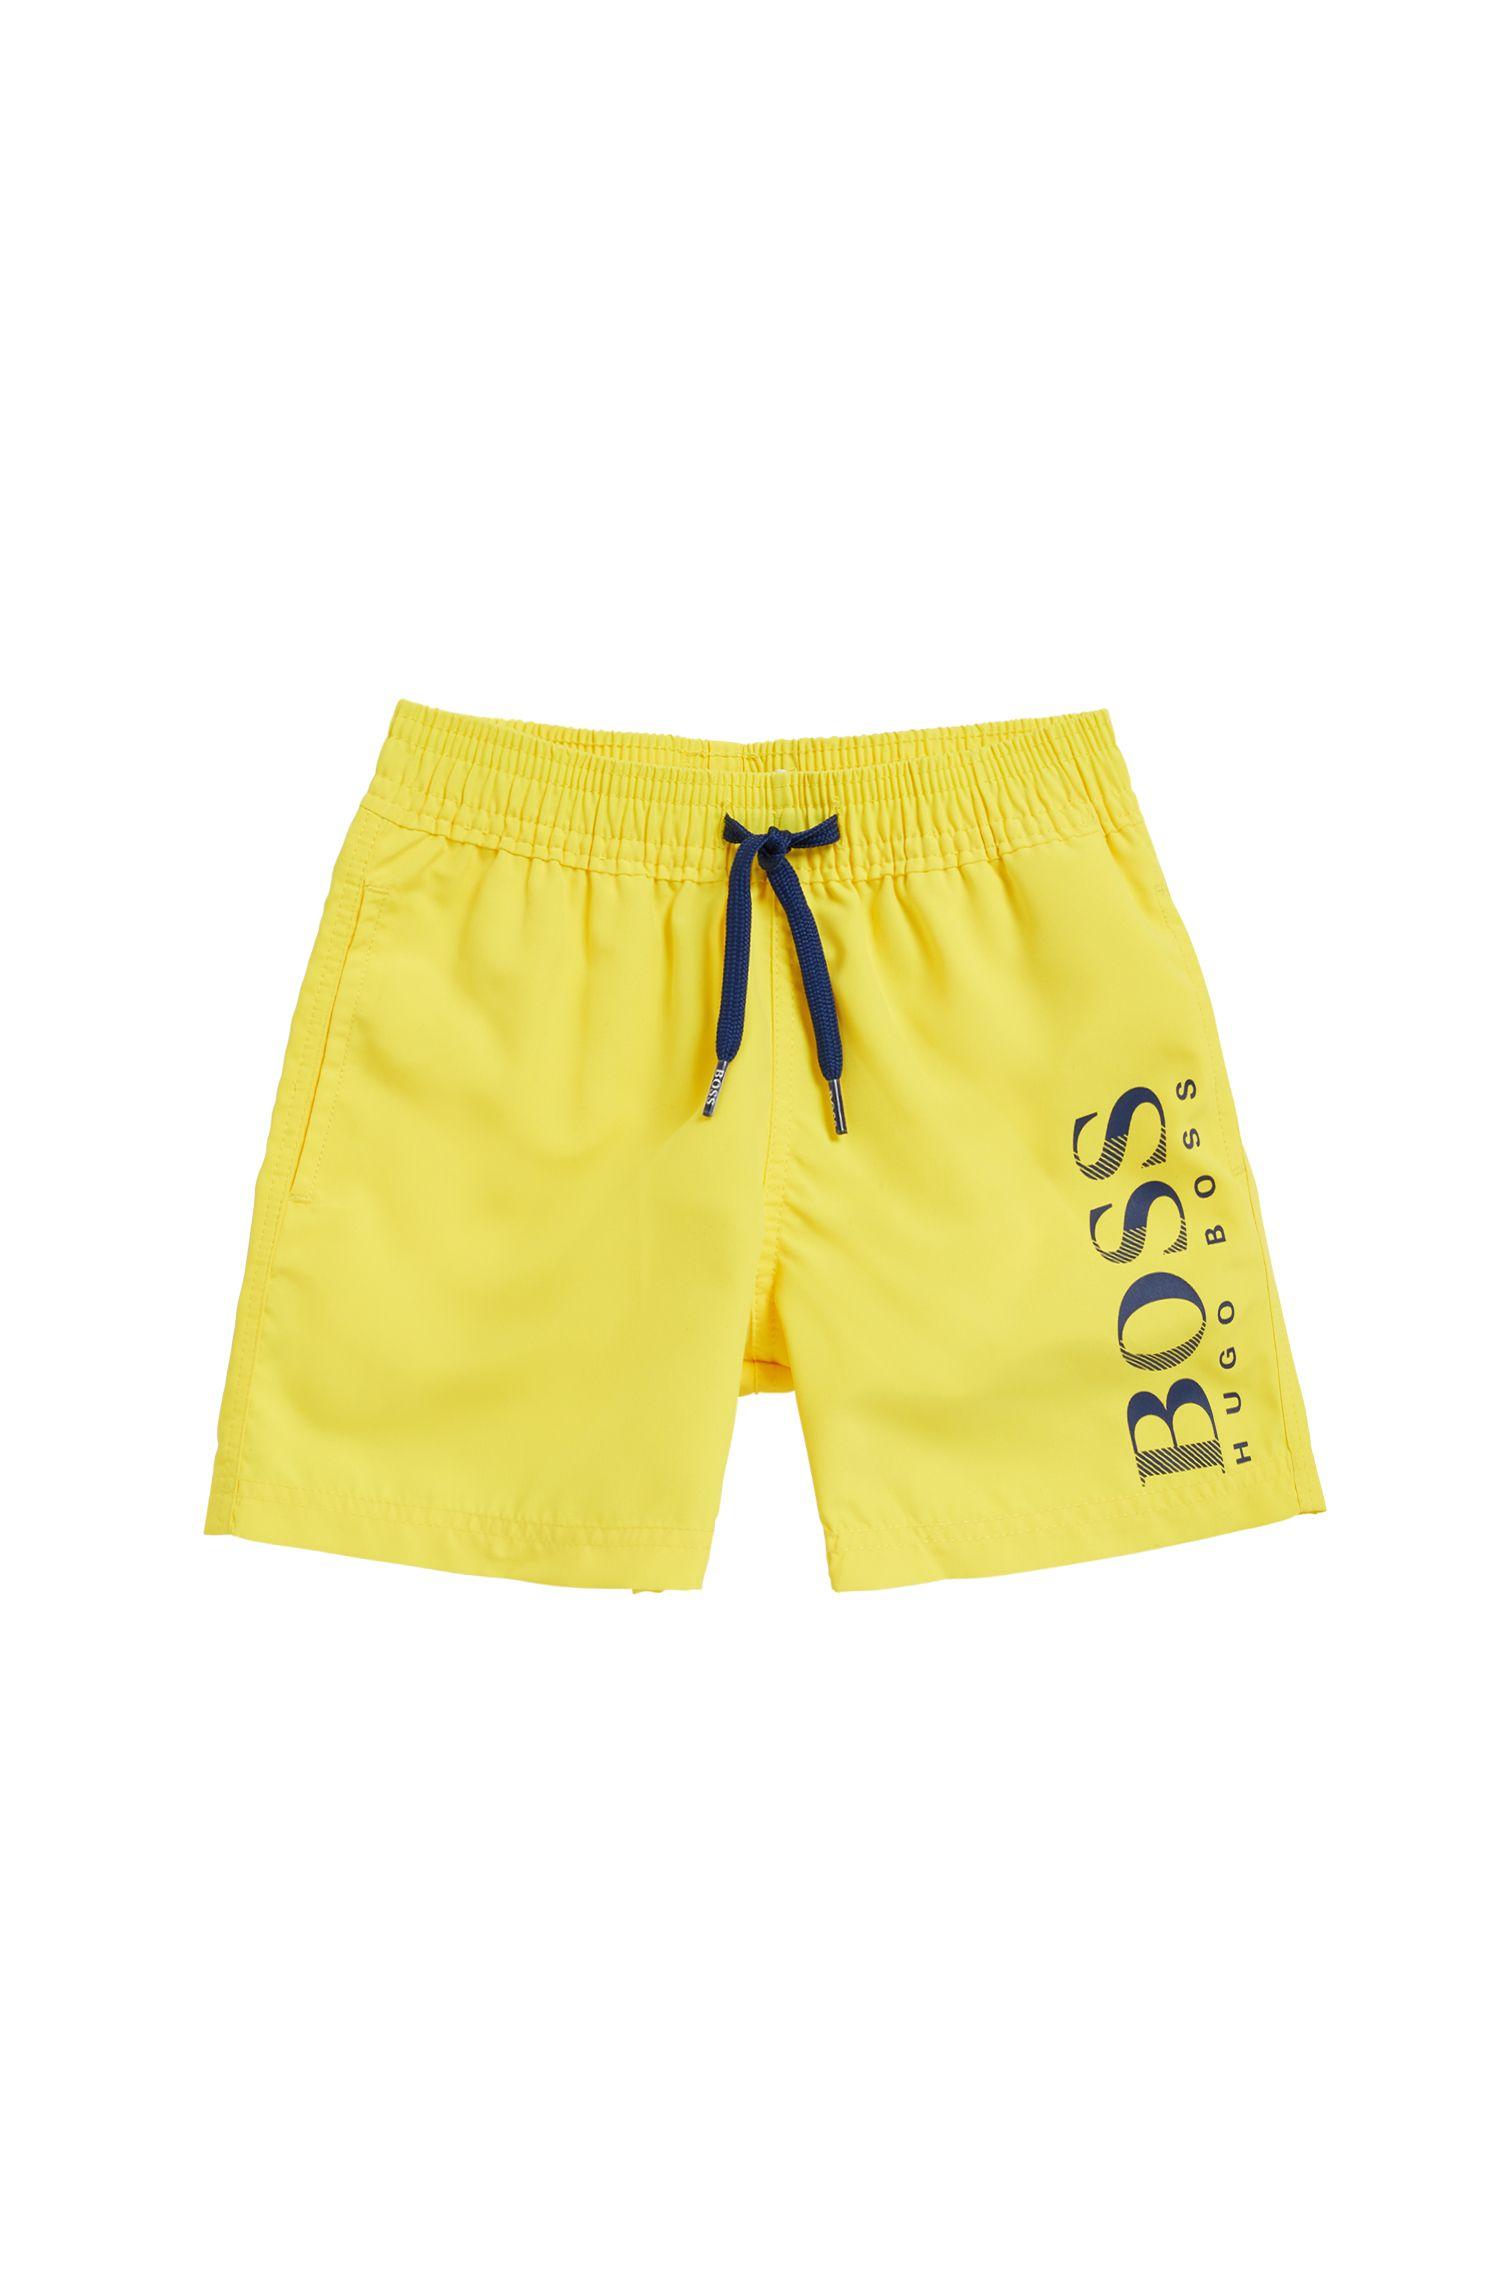 Kids' quick-dry swim shorts with logo print